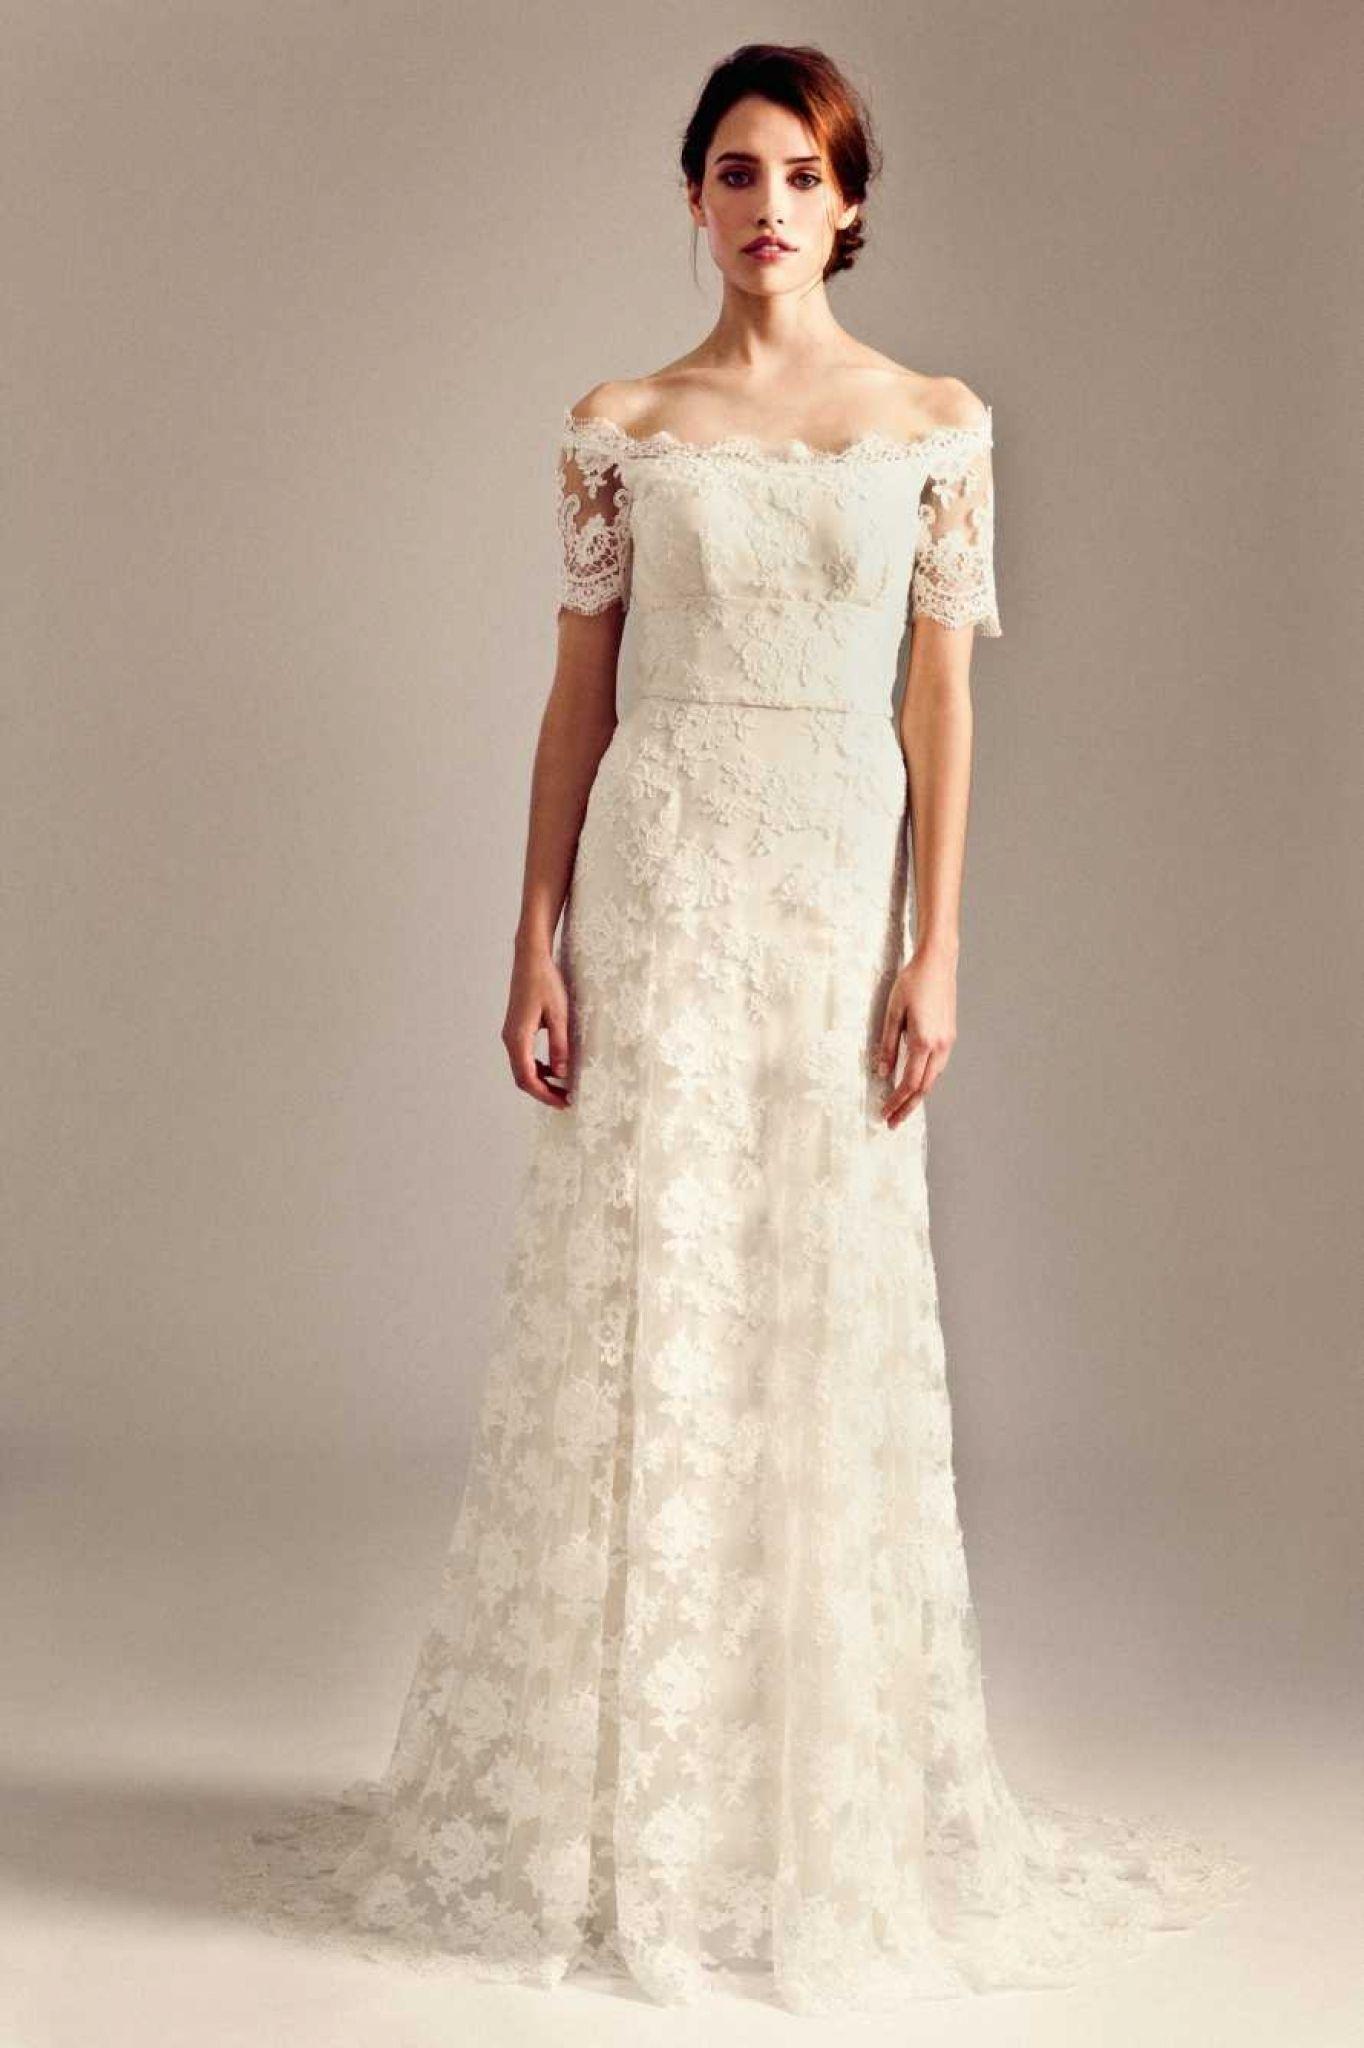 alice temperley wedding dresses - best wedding dress for pear shaped ...